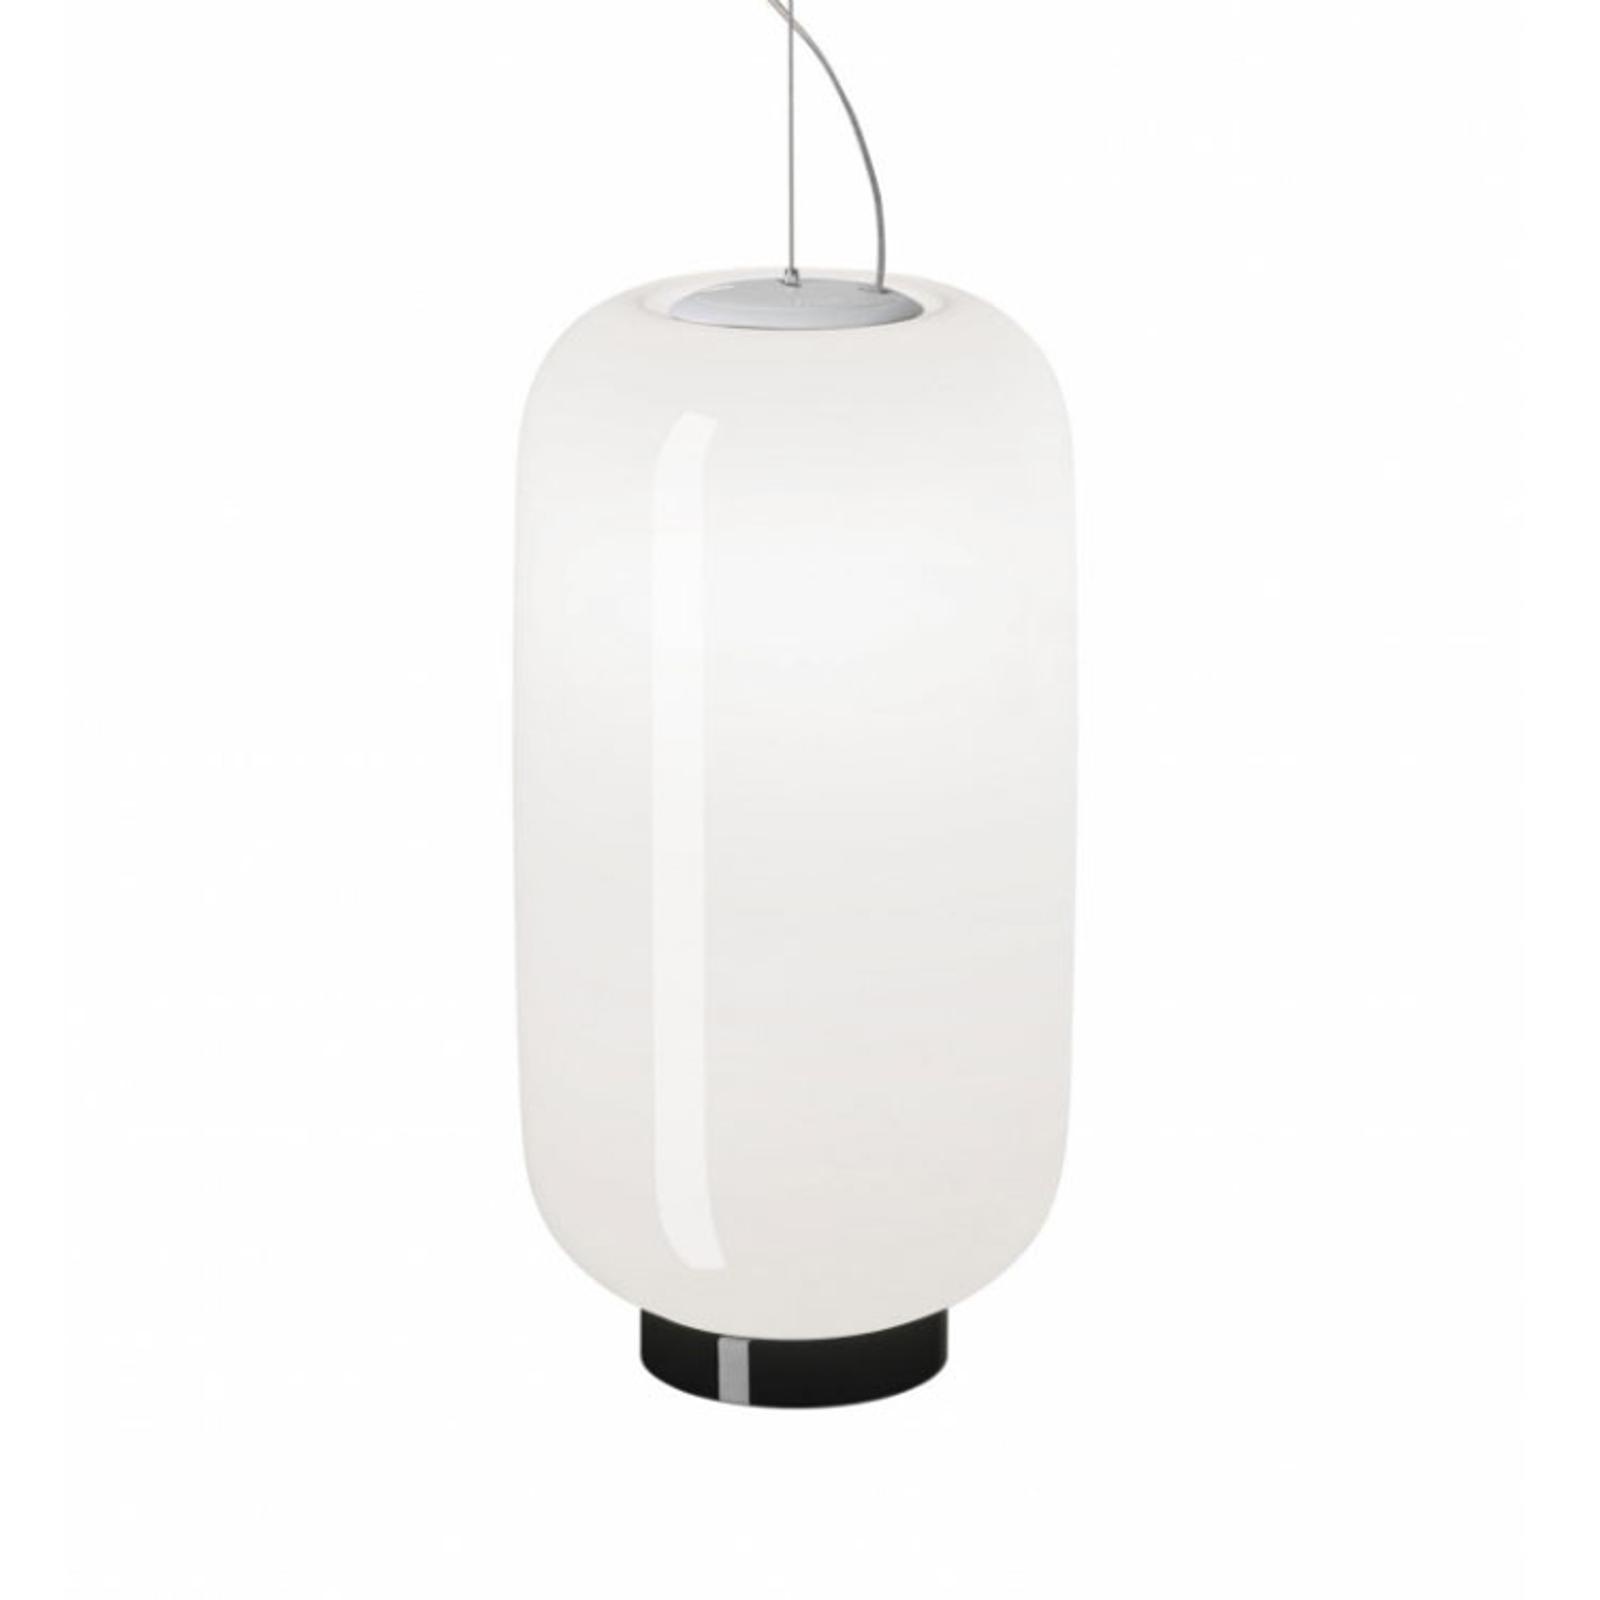 Foscarini Chouchin Reverse 2 LED black/weiß dimm